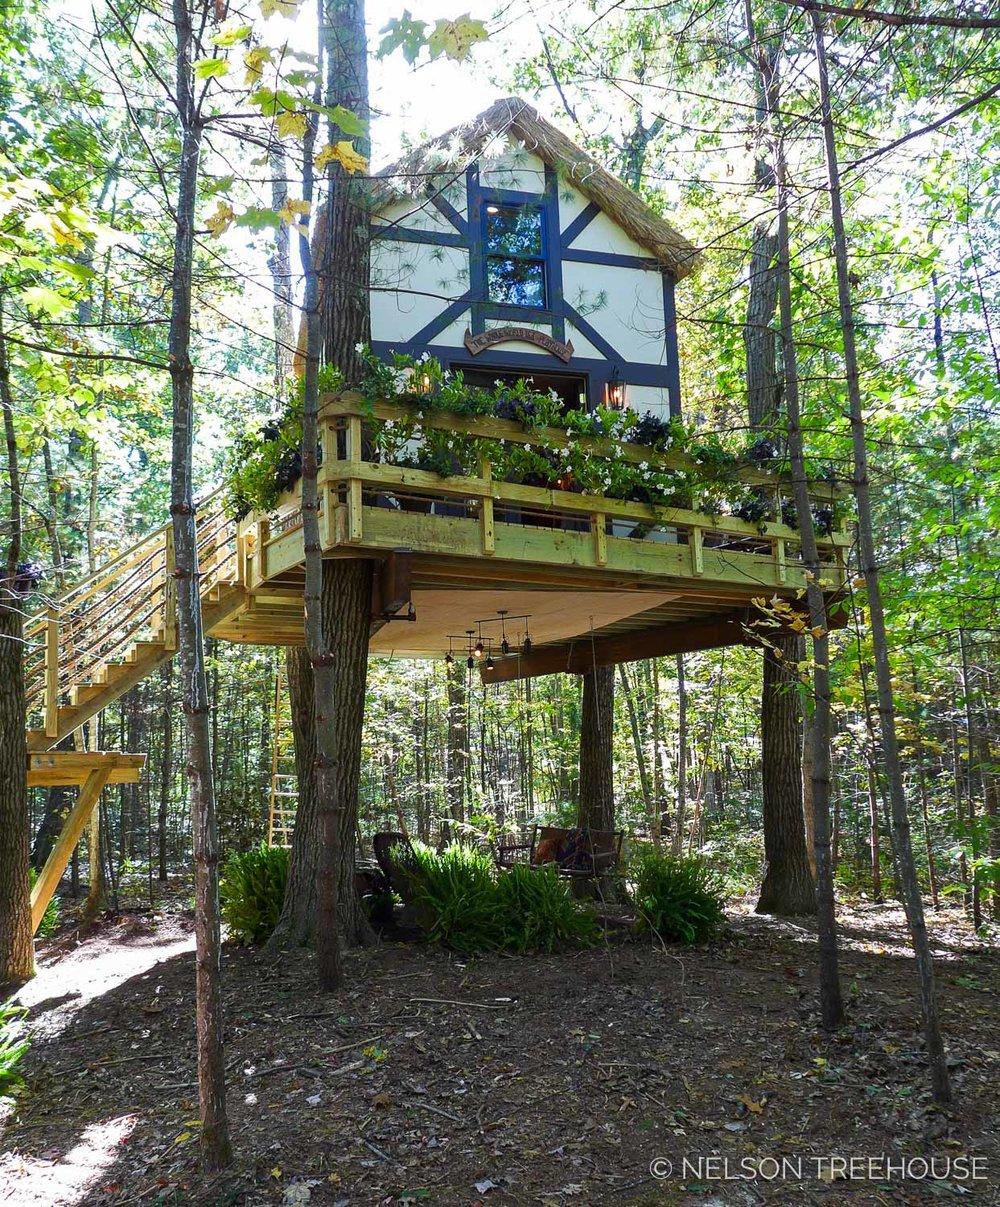 MA-Nelson-Treehouse-2017-1.jpg